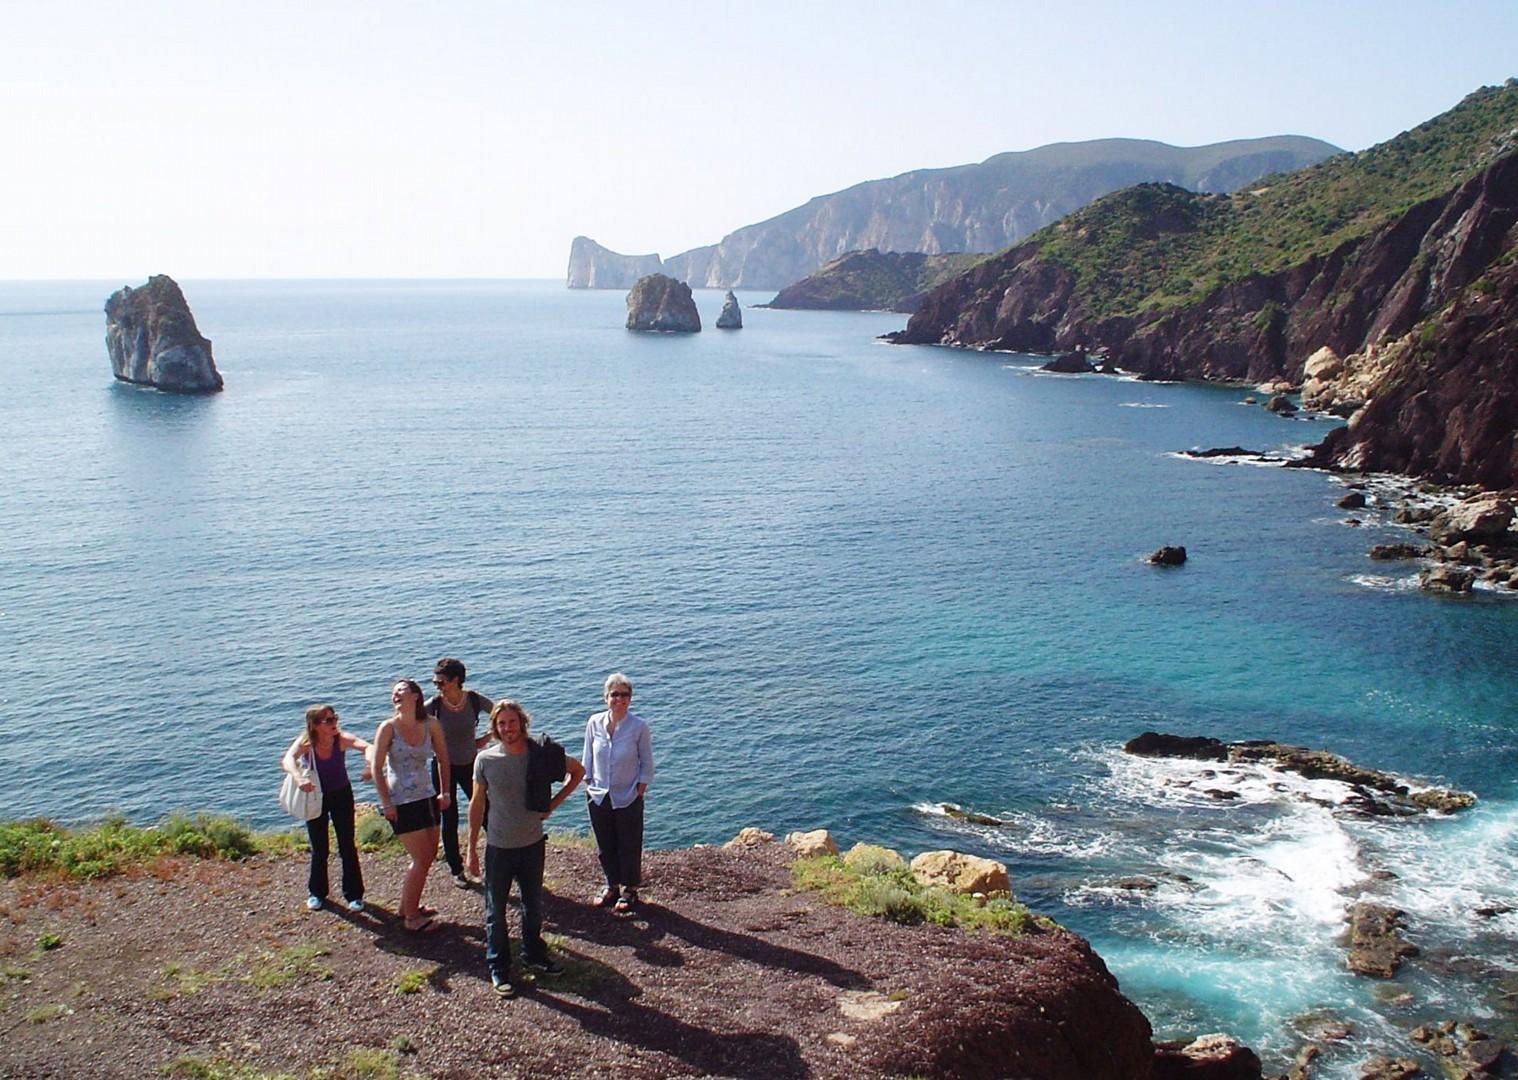 islands-sardinia-italy-coastal-cycling.jpg - Sardinia - Island Flavours - Guided Leisure Cycling Holiday - Leisure Cycling